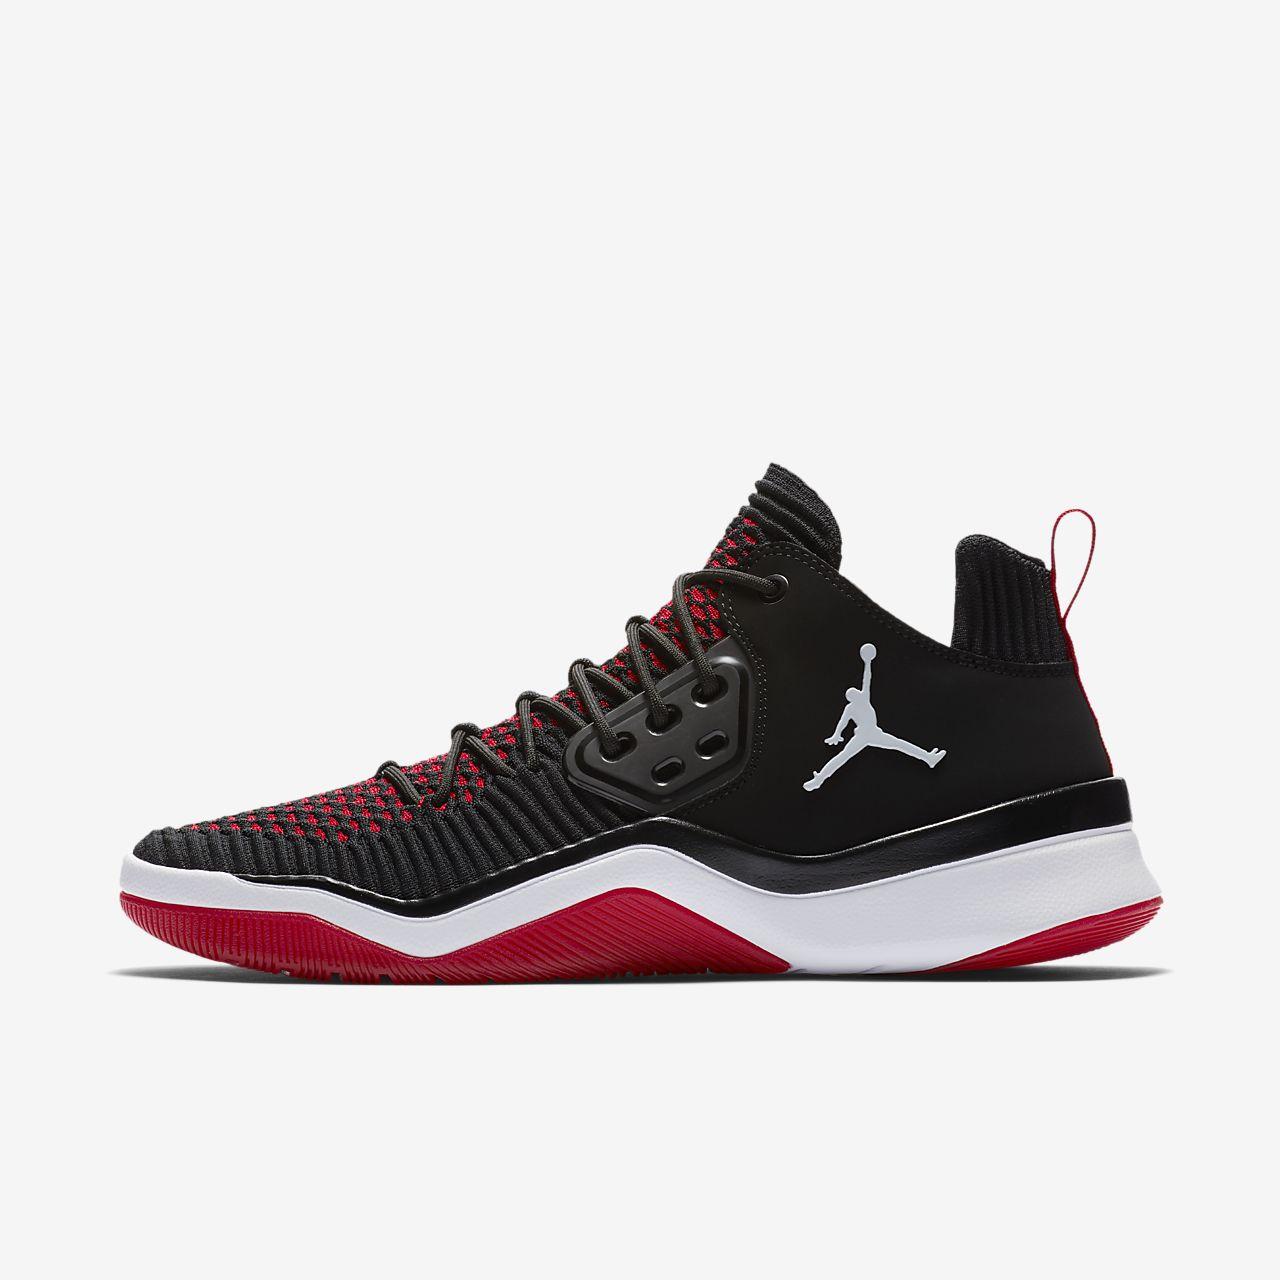 aeab2e99e18 calzado jordan